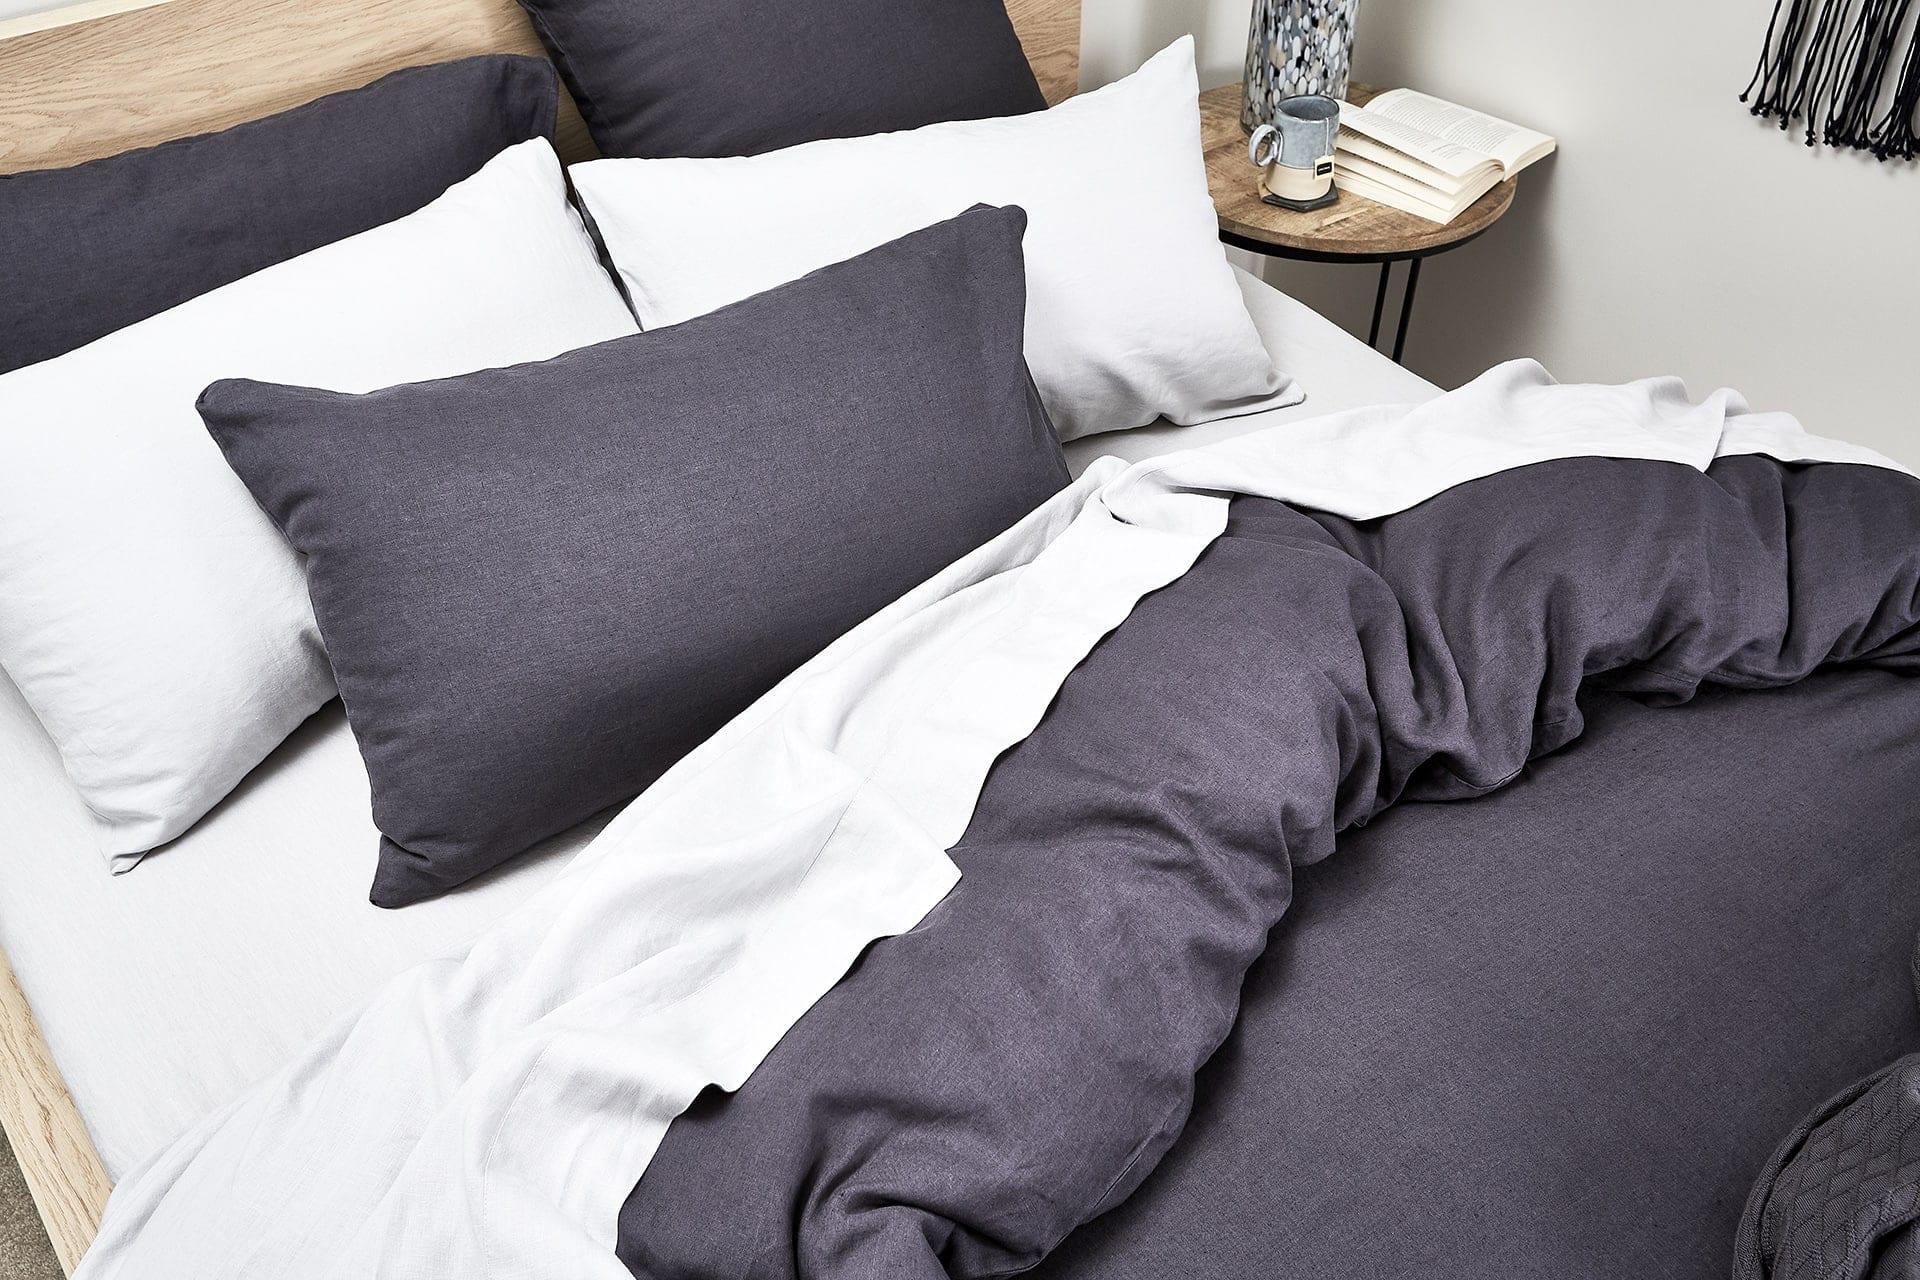 lorraine lea nook dark grey bed linen styling